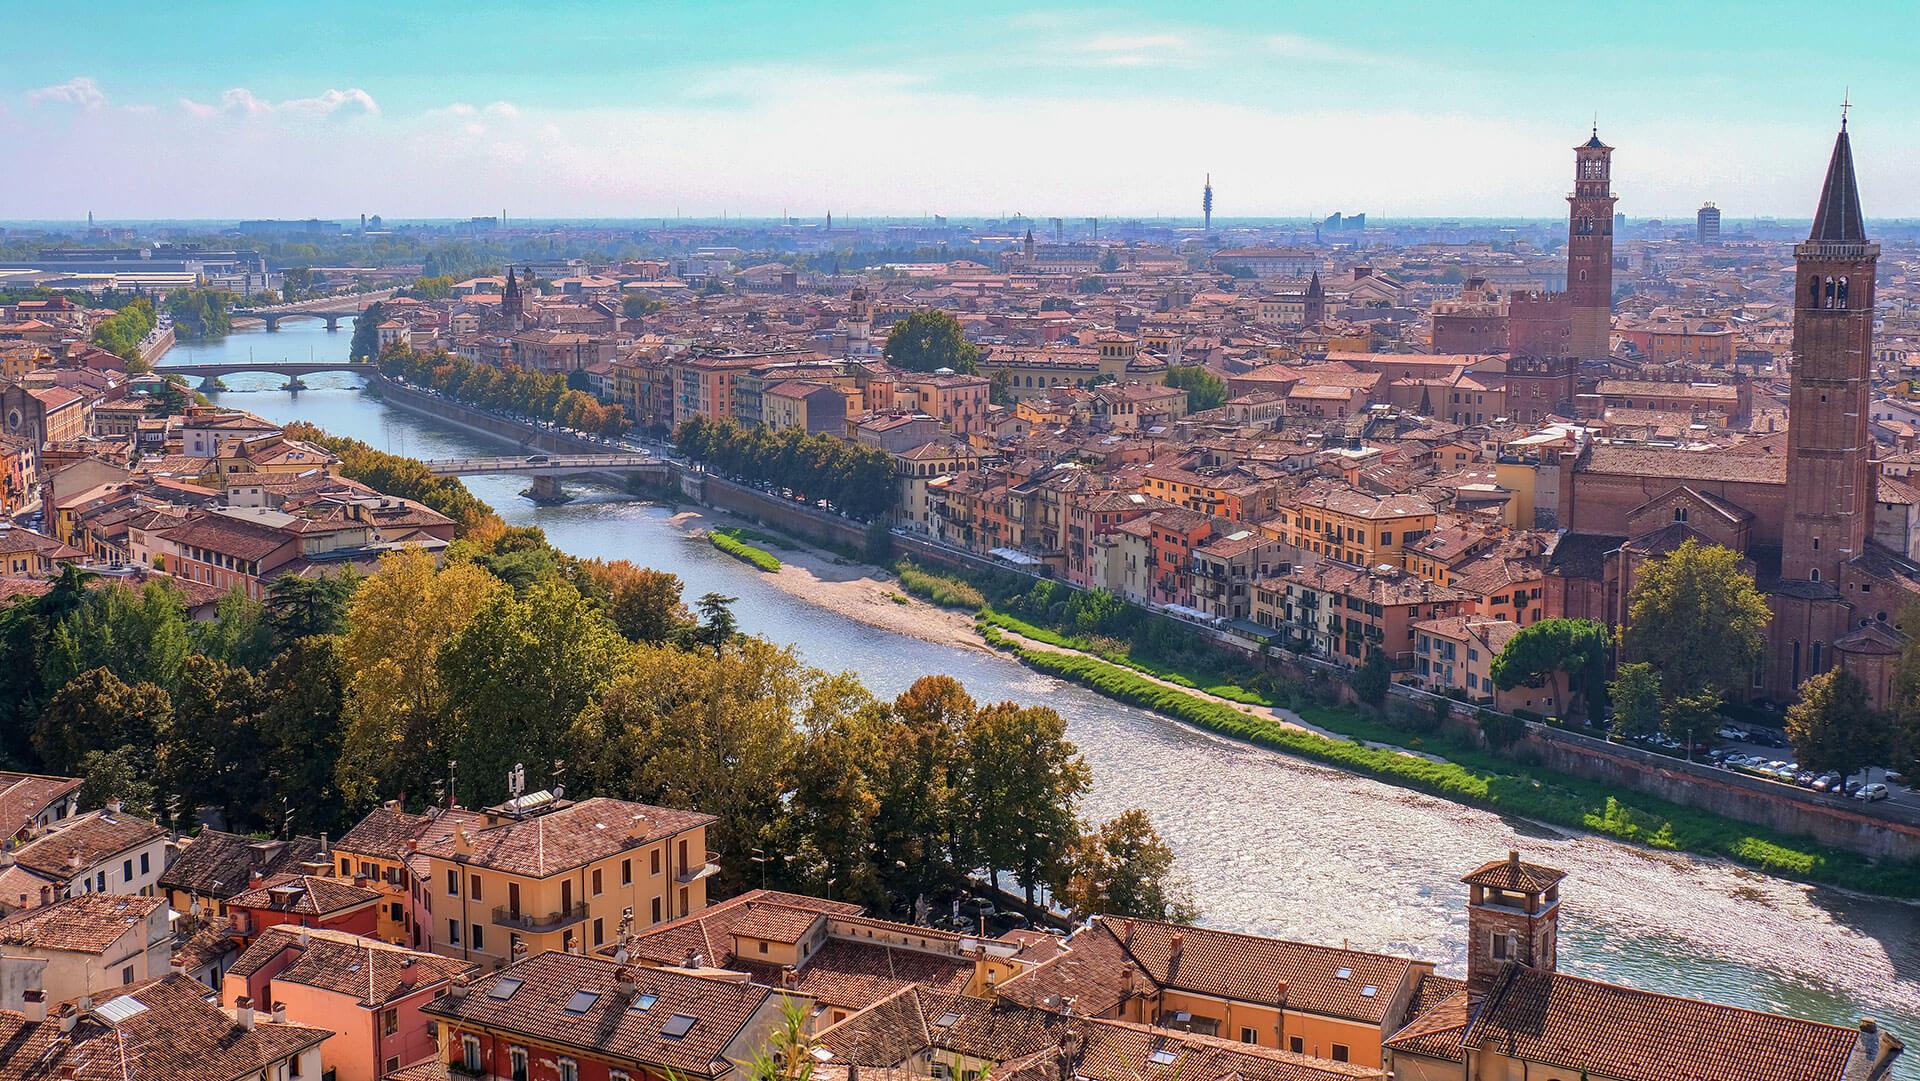 Verona view